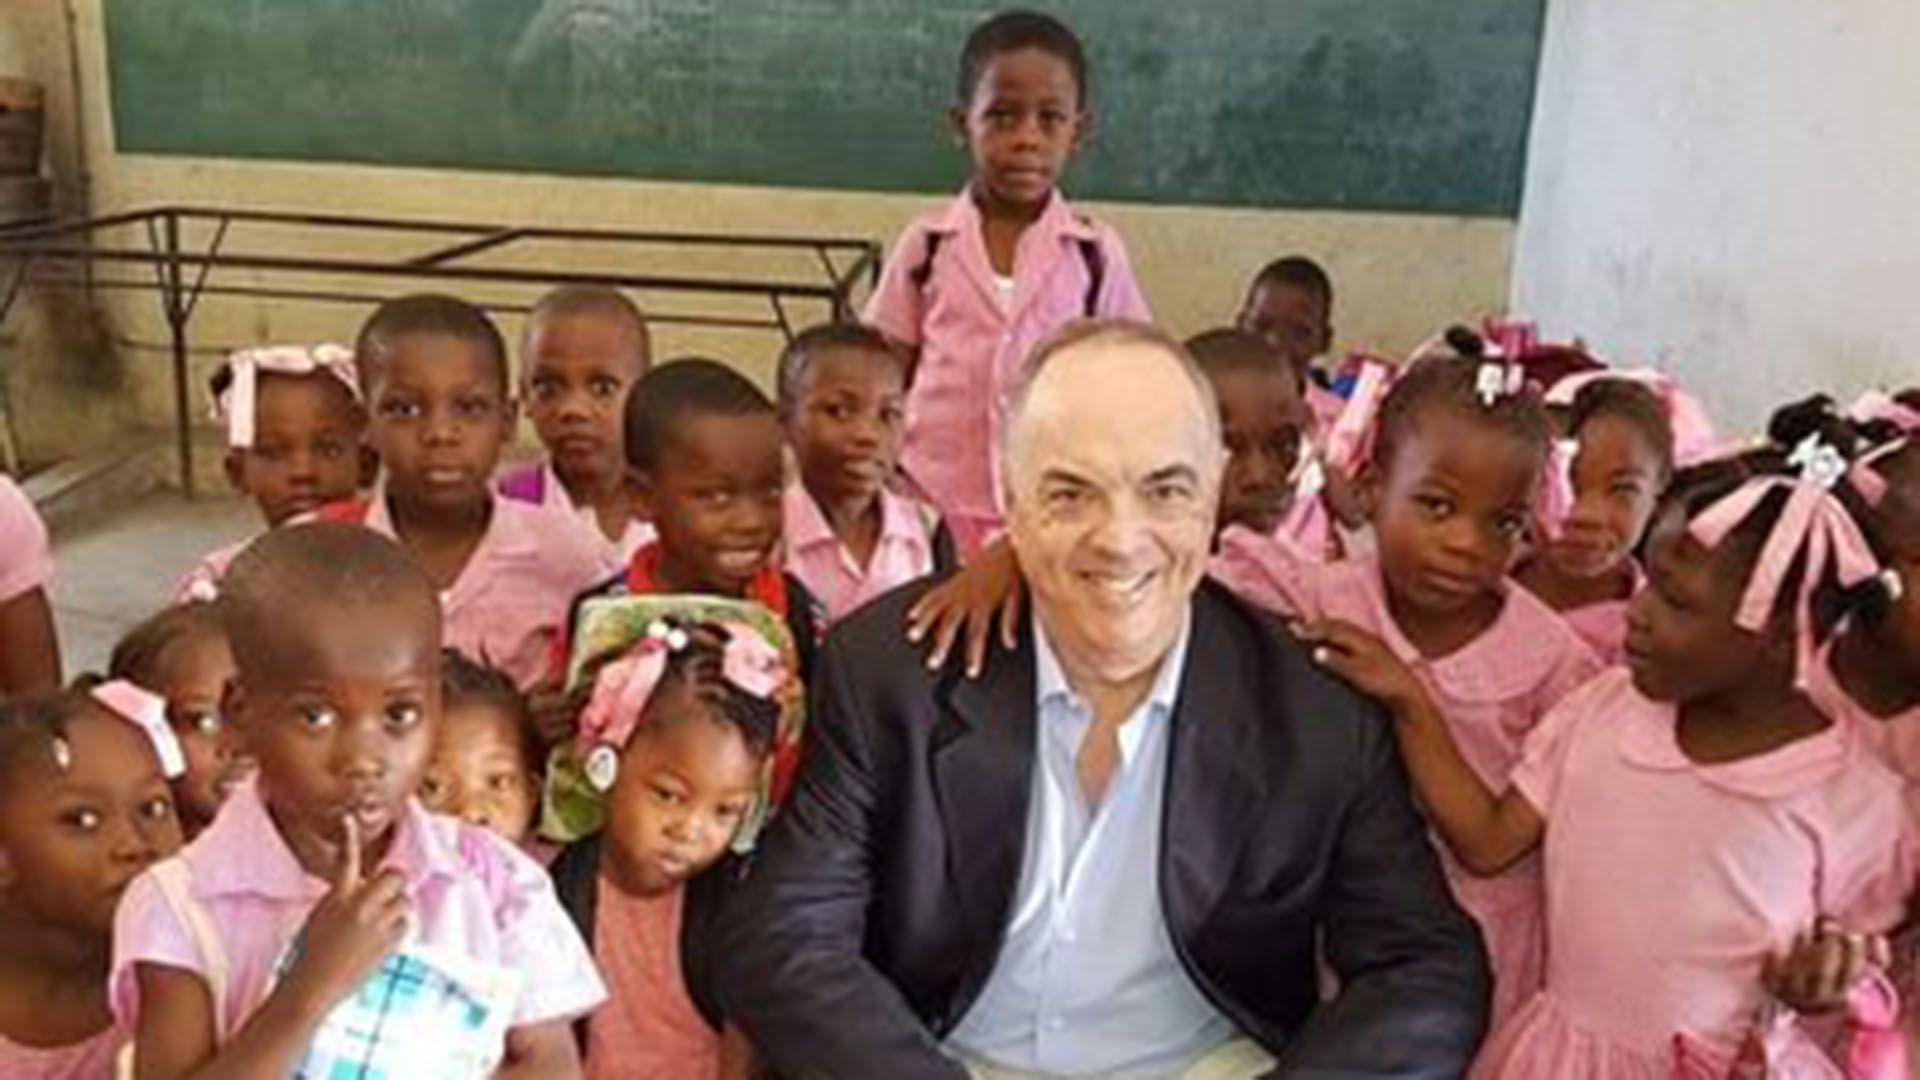 Pedro Von Eyken se desempeña como Embajador argentino en Haití desde 2017 (@von_eyken)